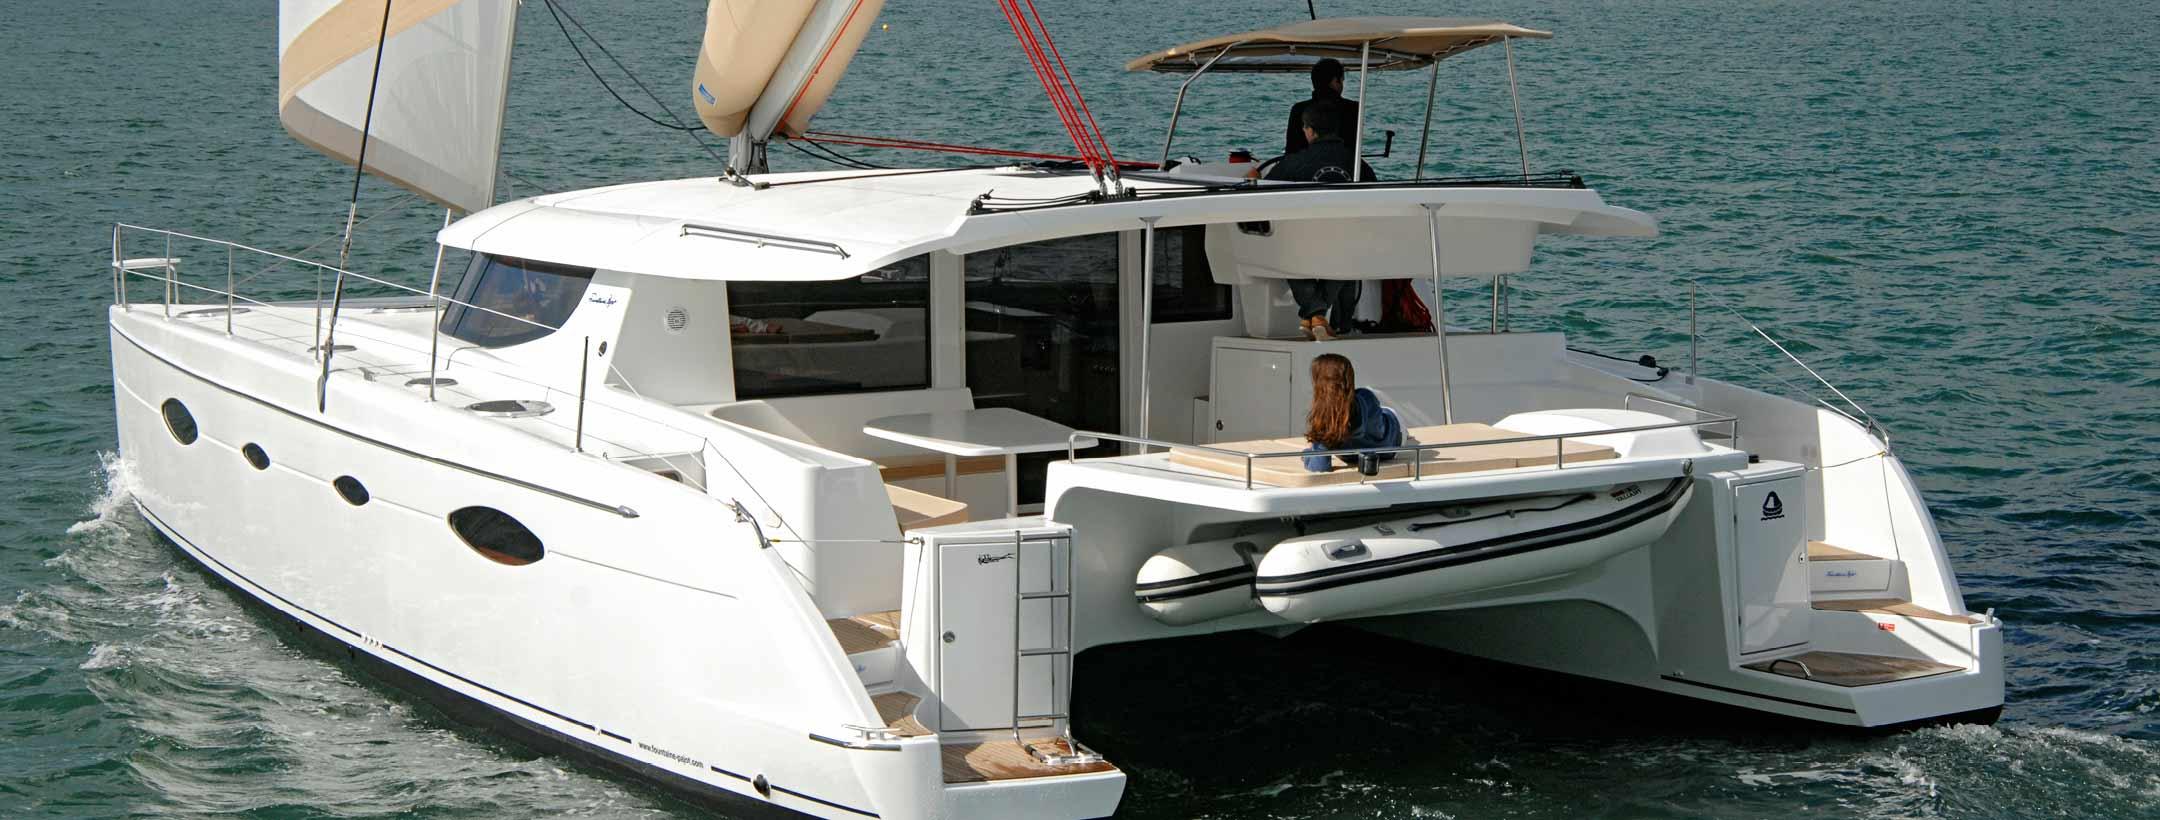 TradeWinds 50 Cruising Class Yacht stern view